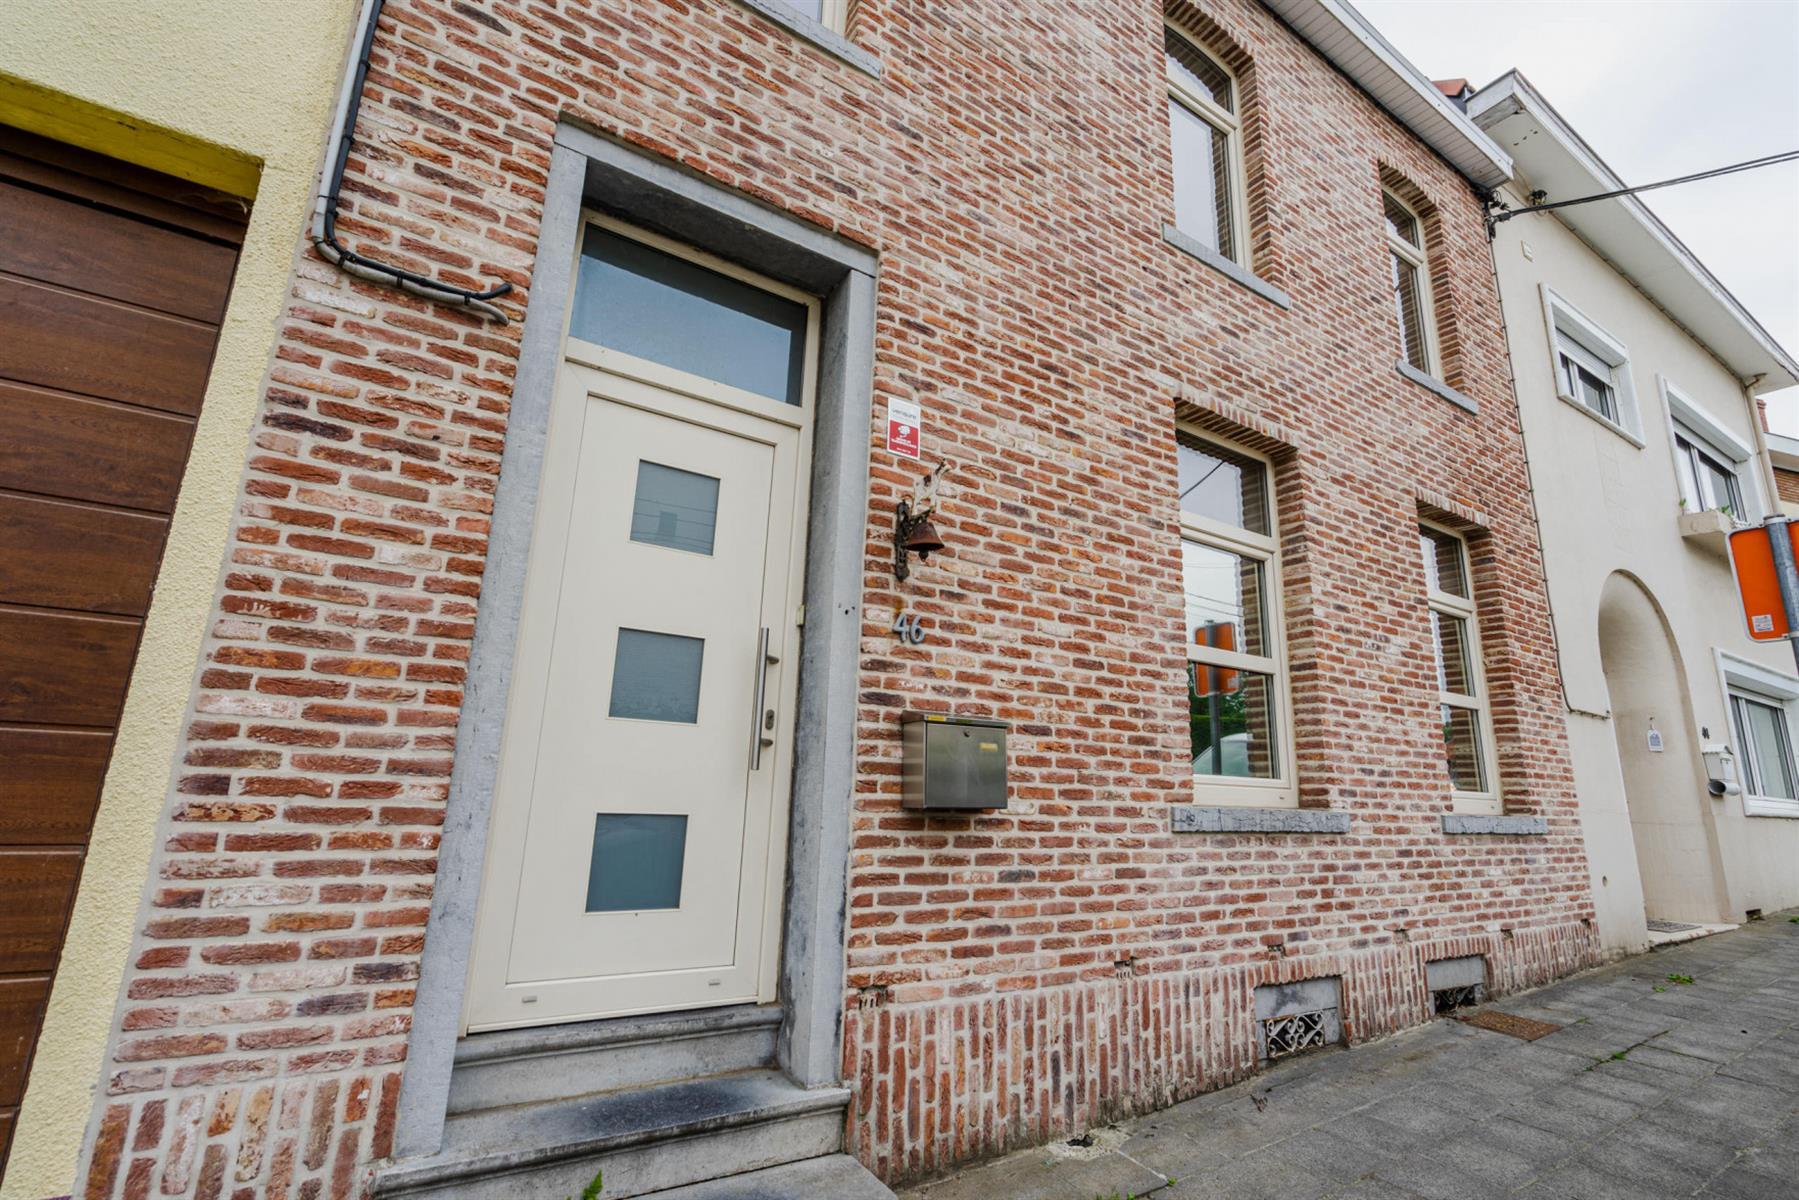 Maison - Bousval - #4395358-2